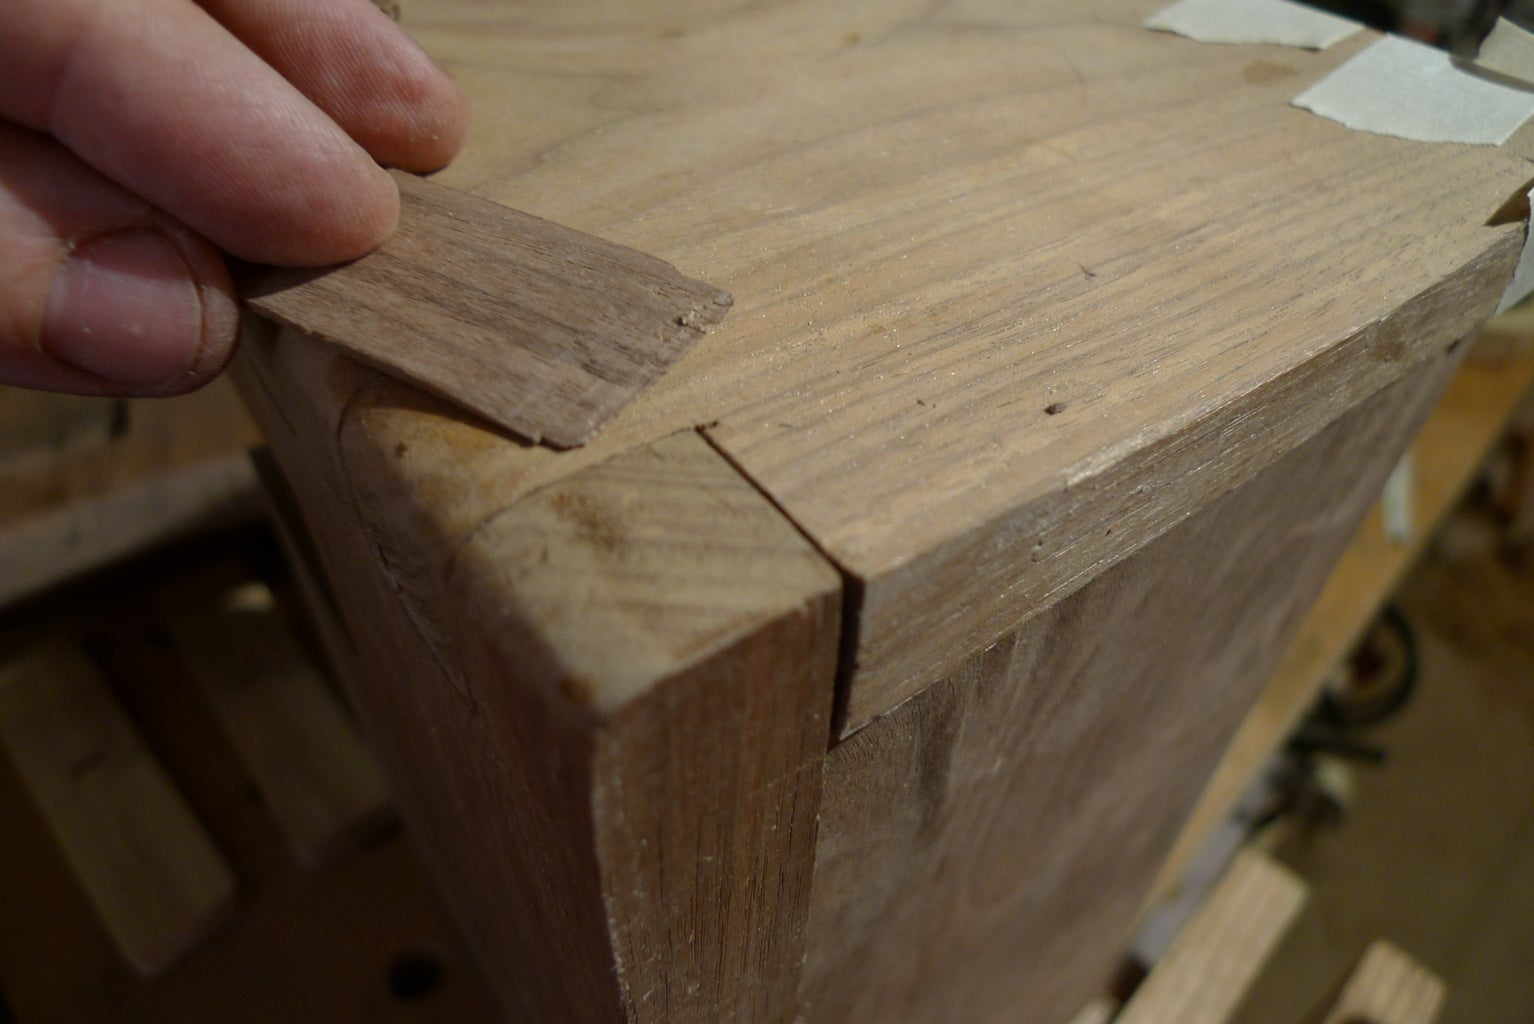 Disguise Poor Joints/workmanship!